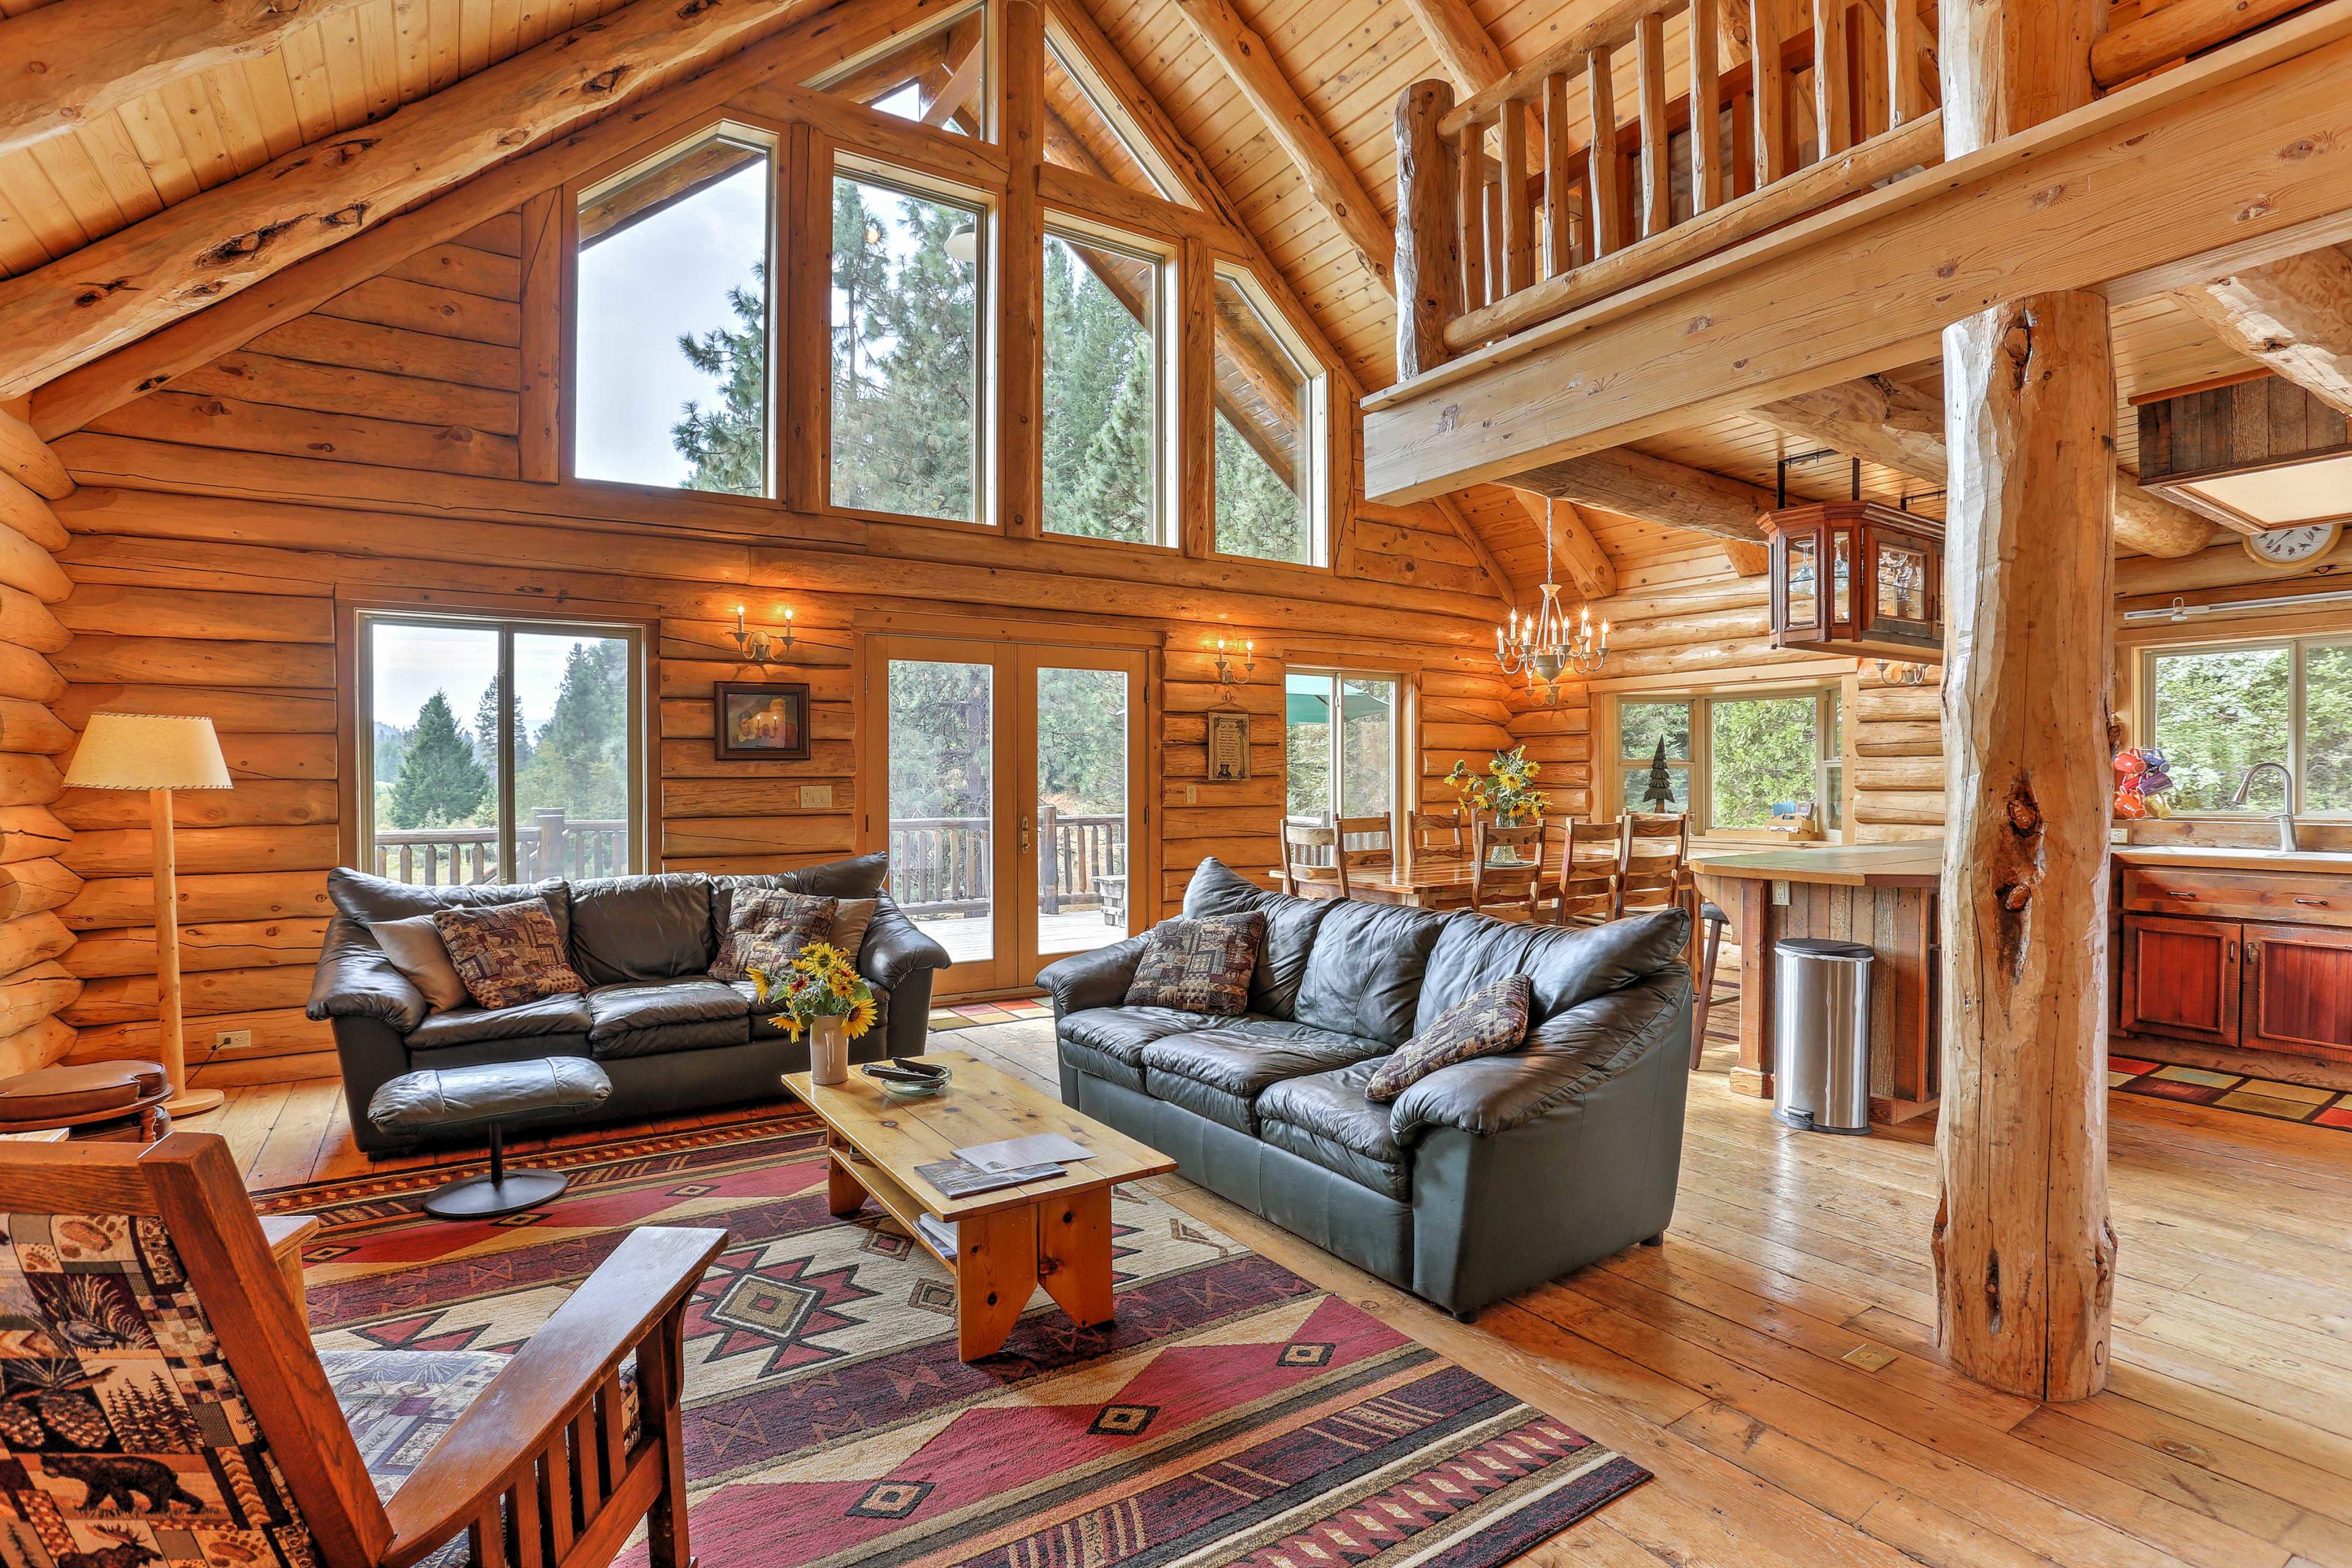 This log cabin-style 4-bedroom, 3-bath vacation rental home sleeps 10.